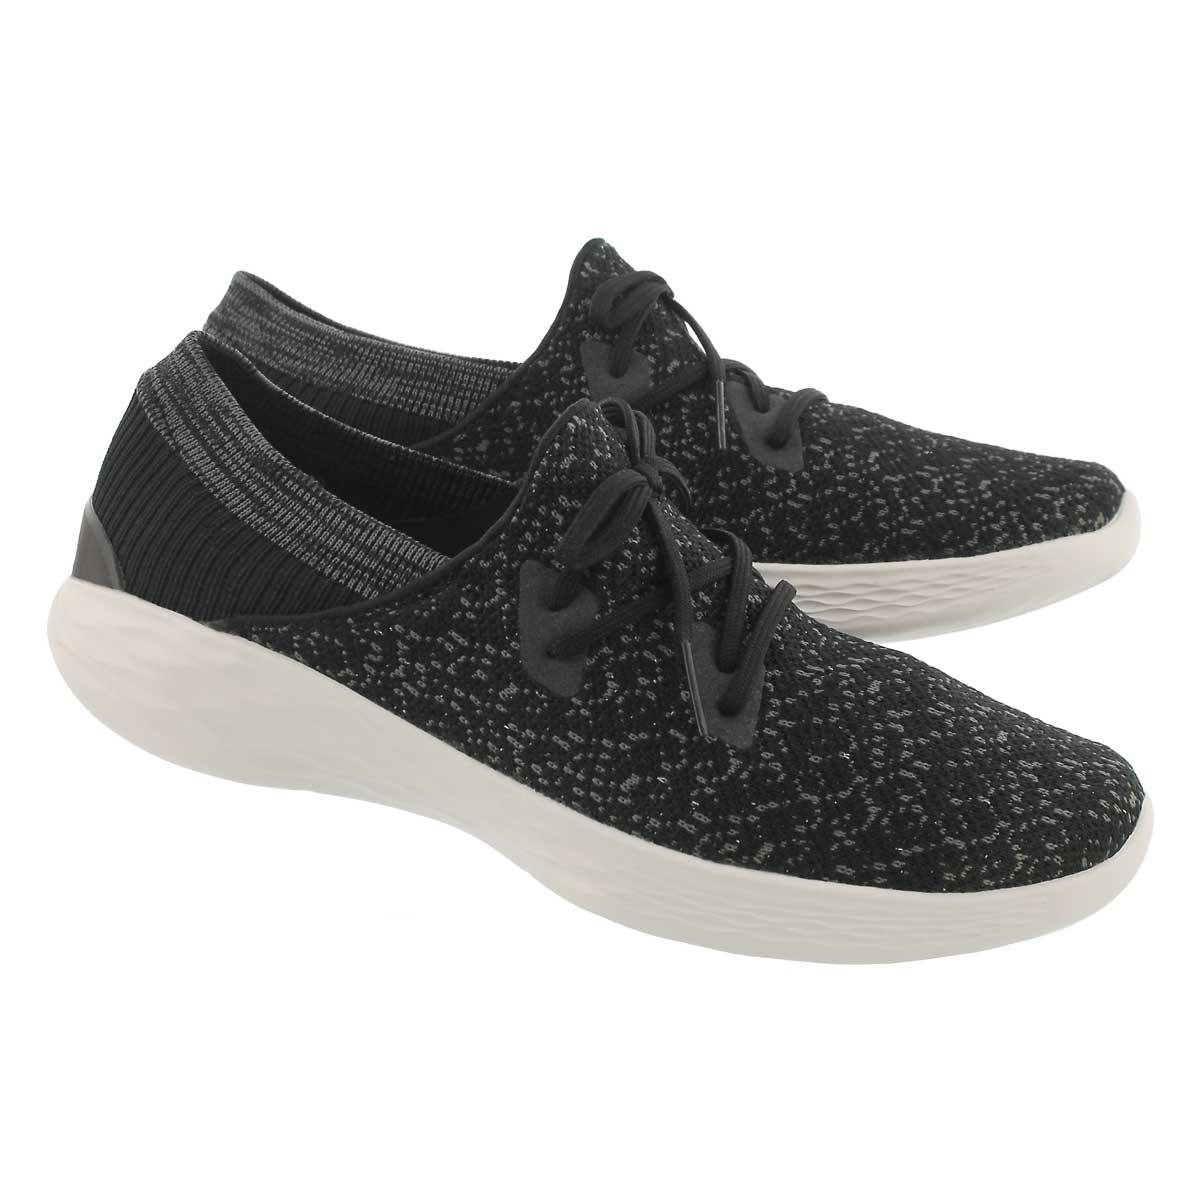 Lds You Exhale blk sprkl slip on sneaker